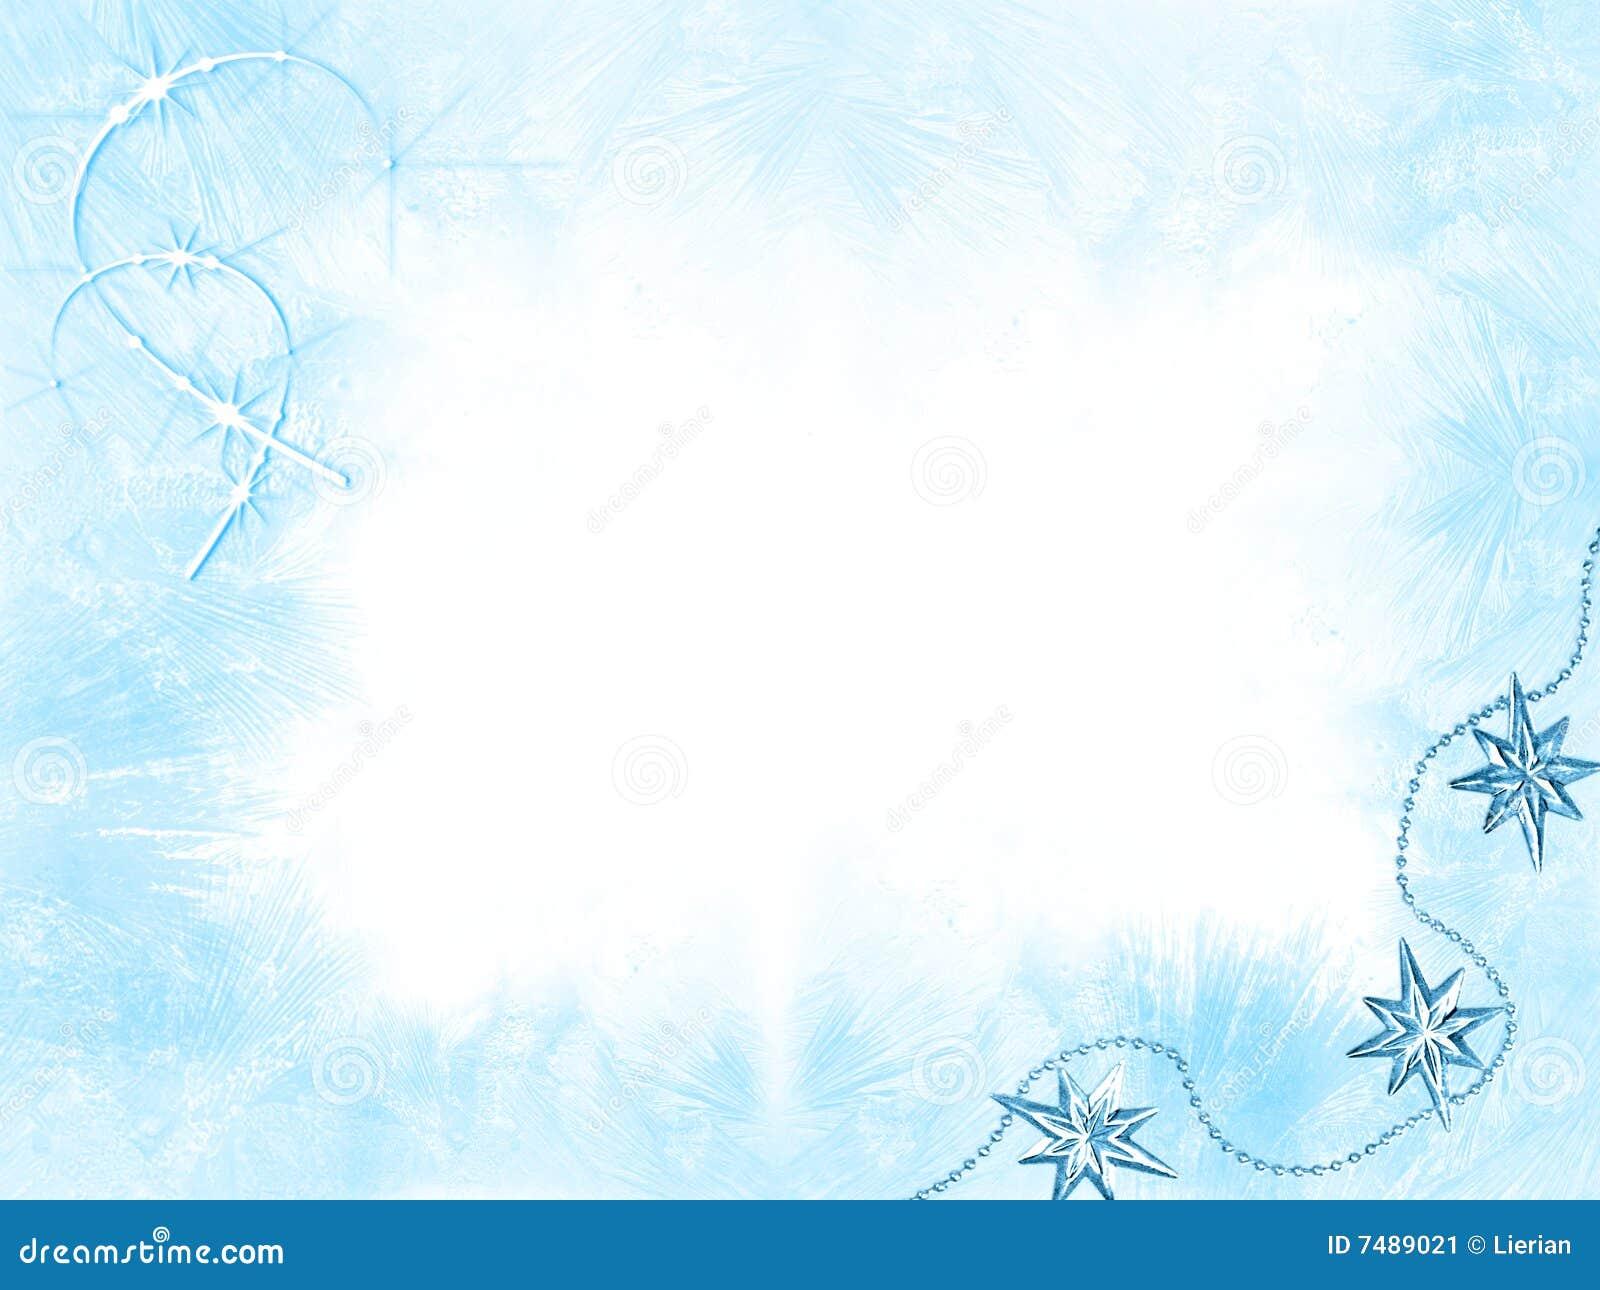 images of blue sky background border calto